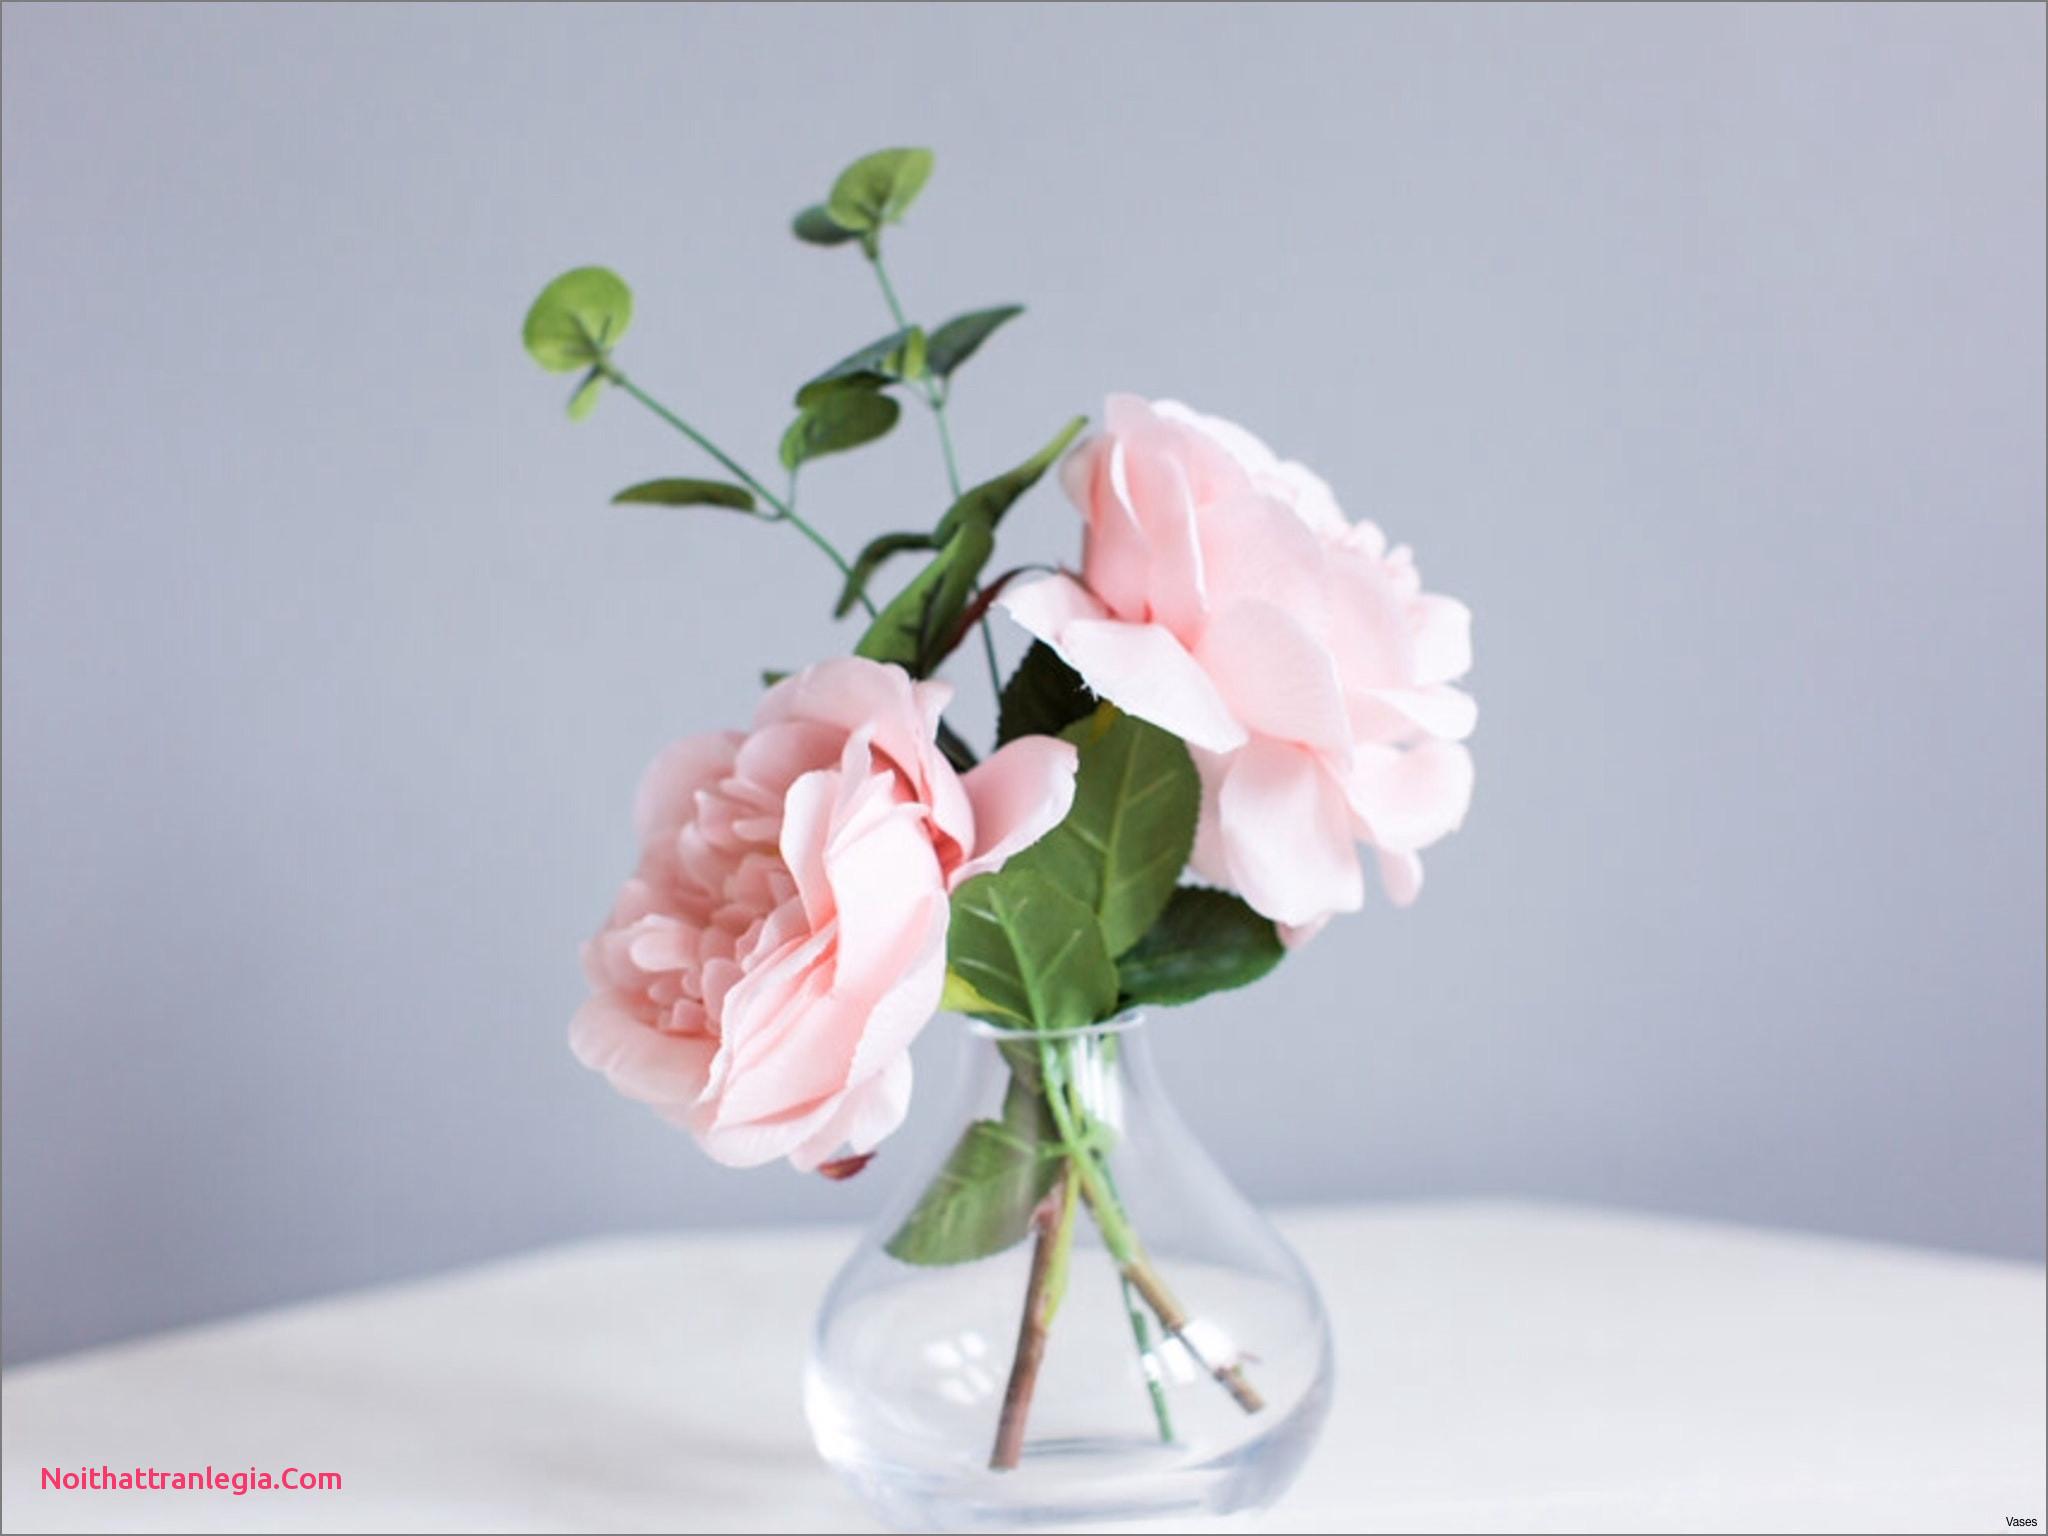 eiffel tower vases wholesale of 20 wedding vases noithattranlegia vases design throughout cool wedding ideas as for h vases bud vase flower arrangements i 0d for inspiration design